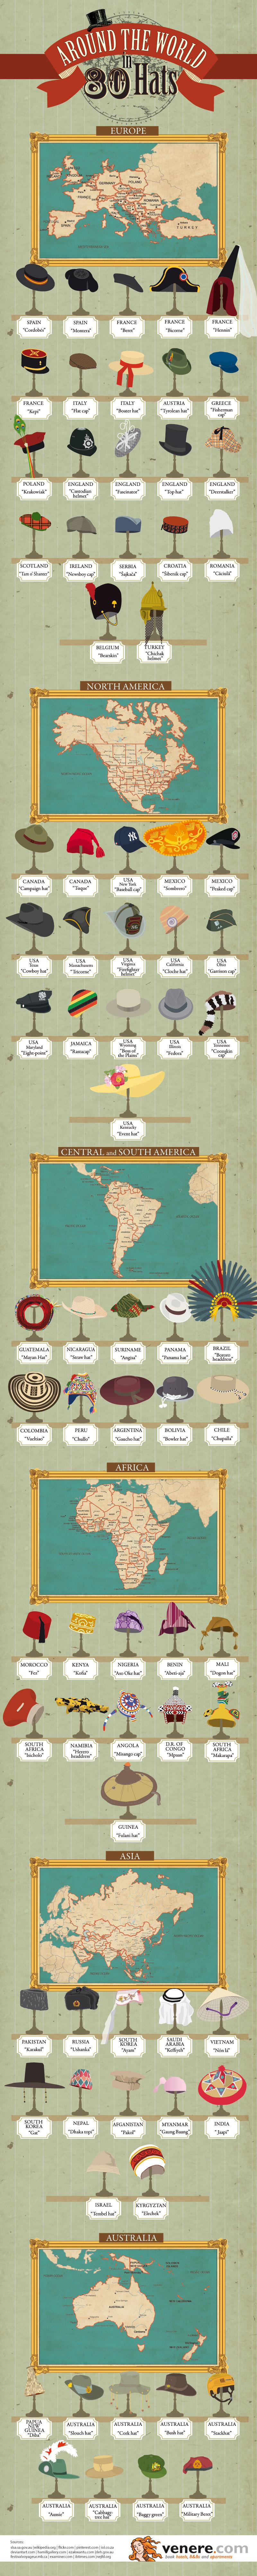 Around The World In 80 Hats